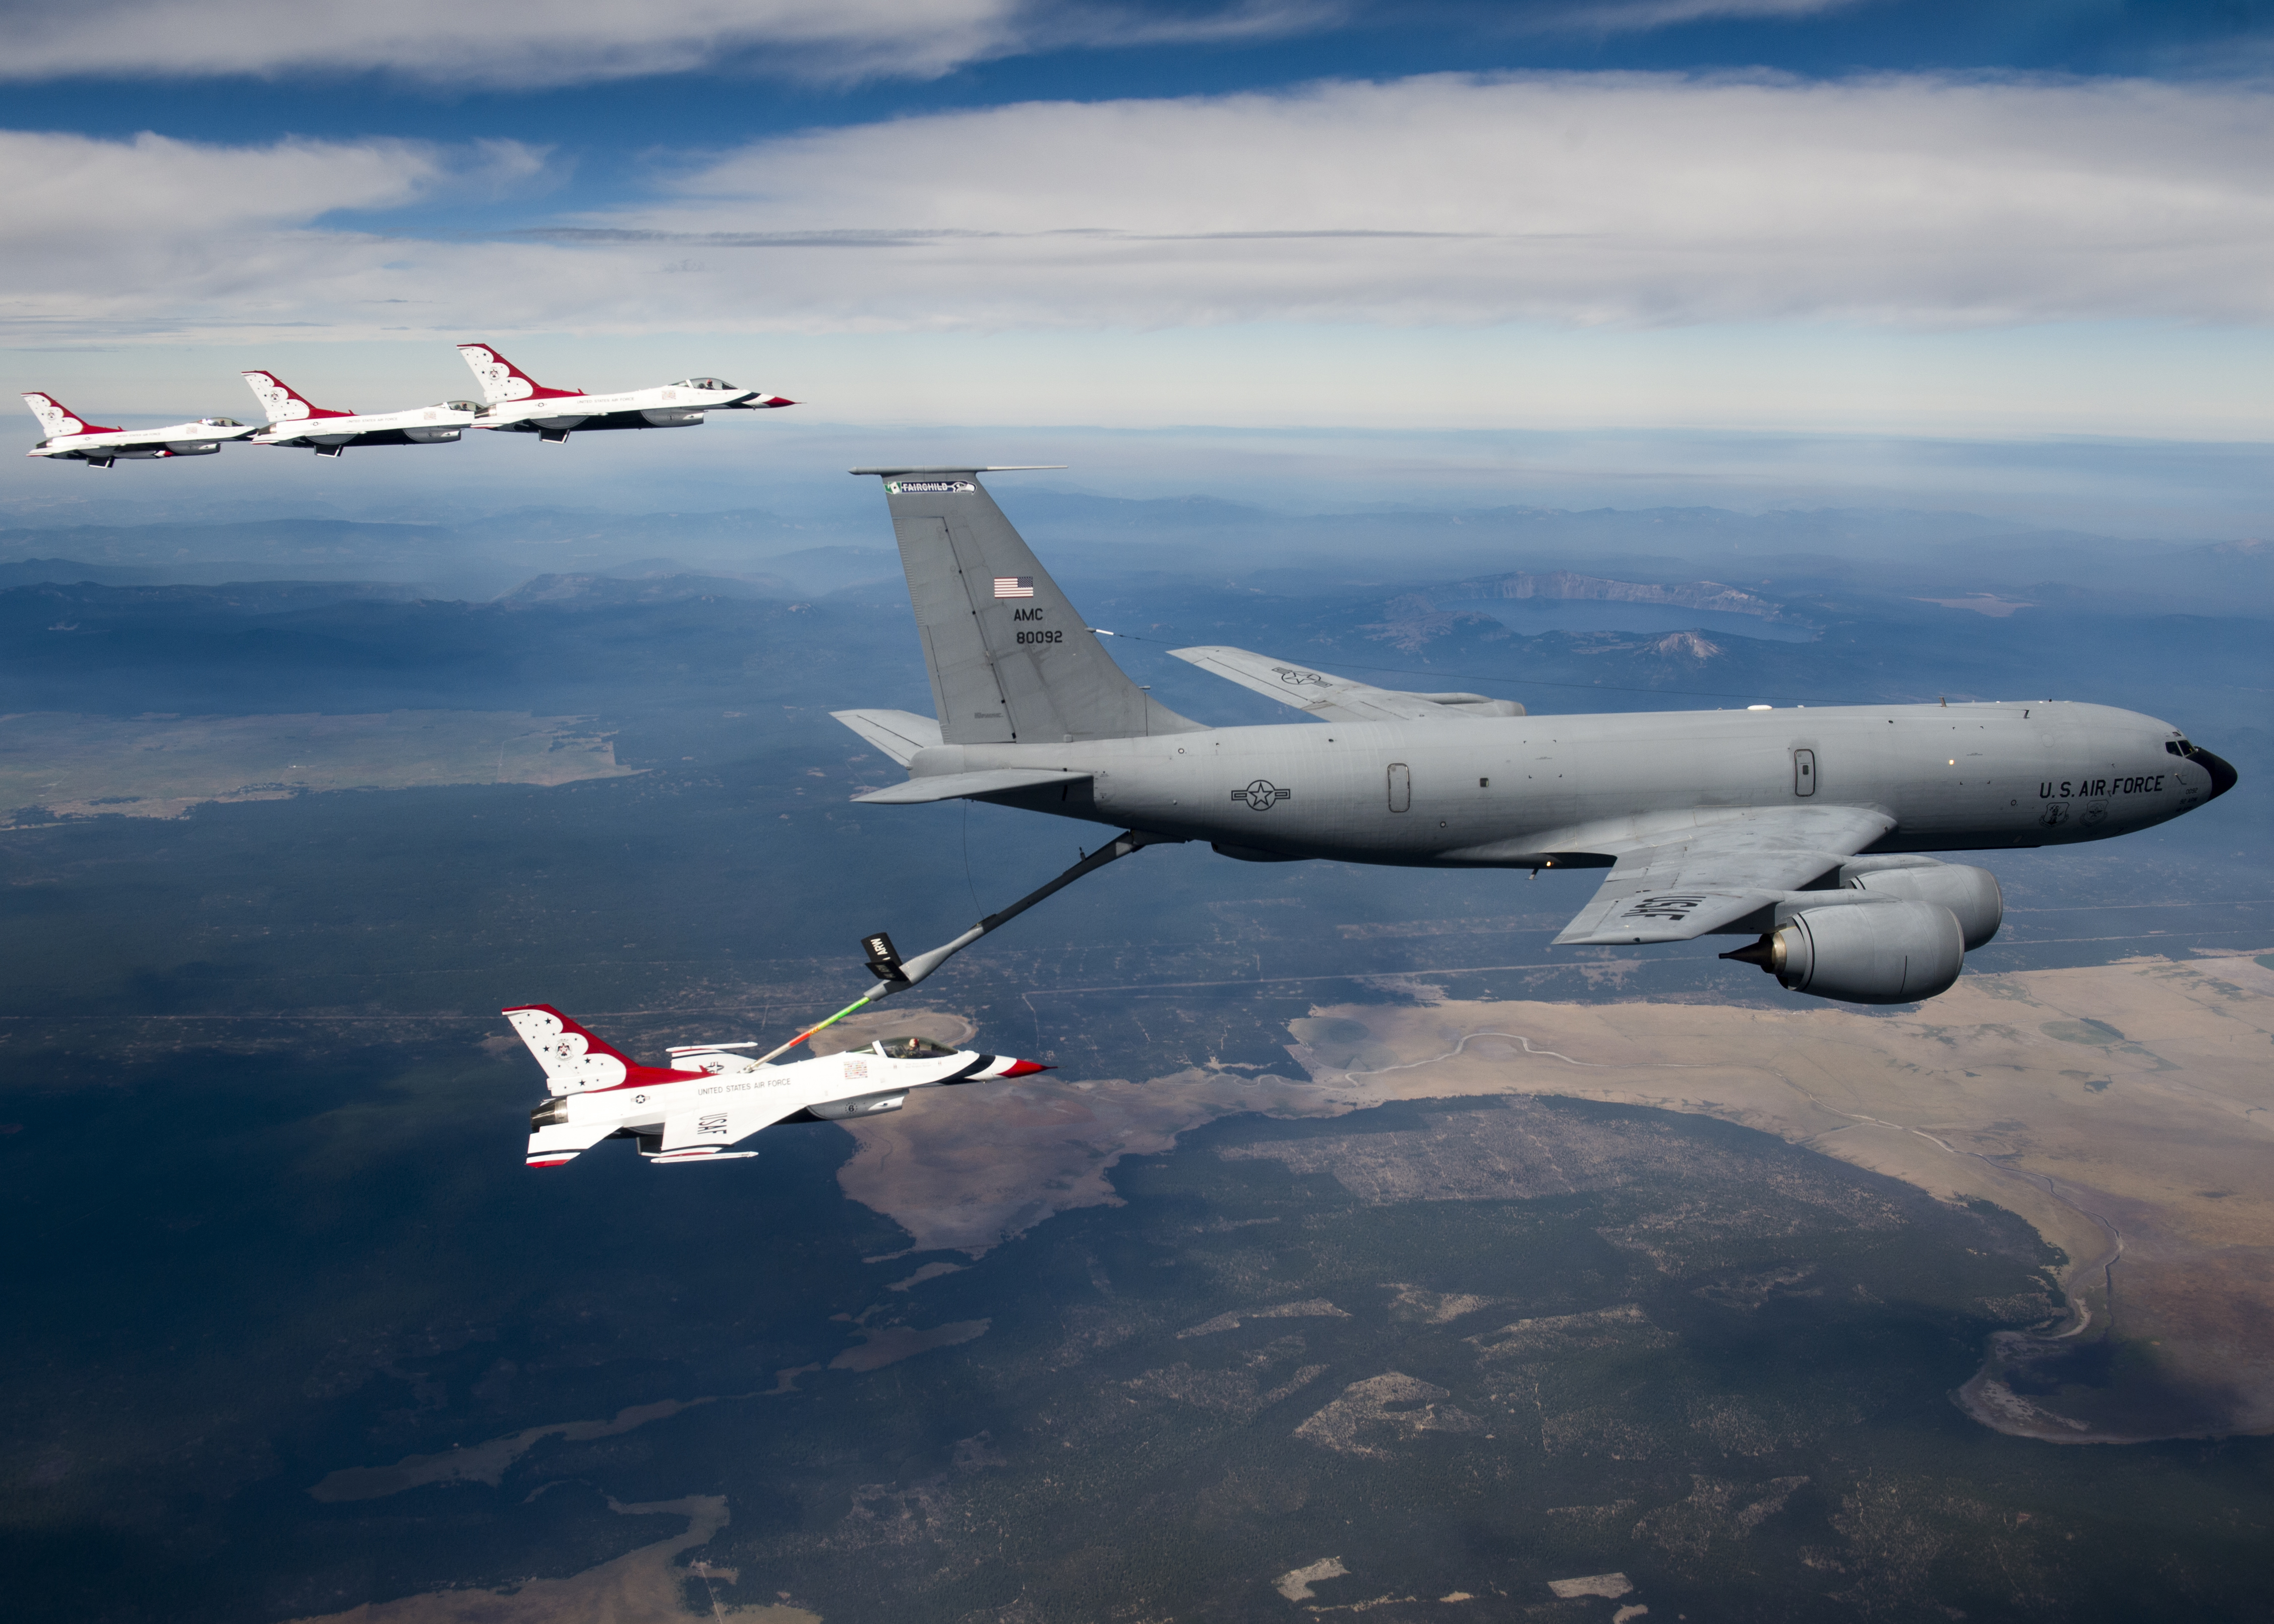 File:Thunderbirds refuelling by a KC-135 tanker.jpg